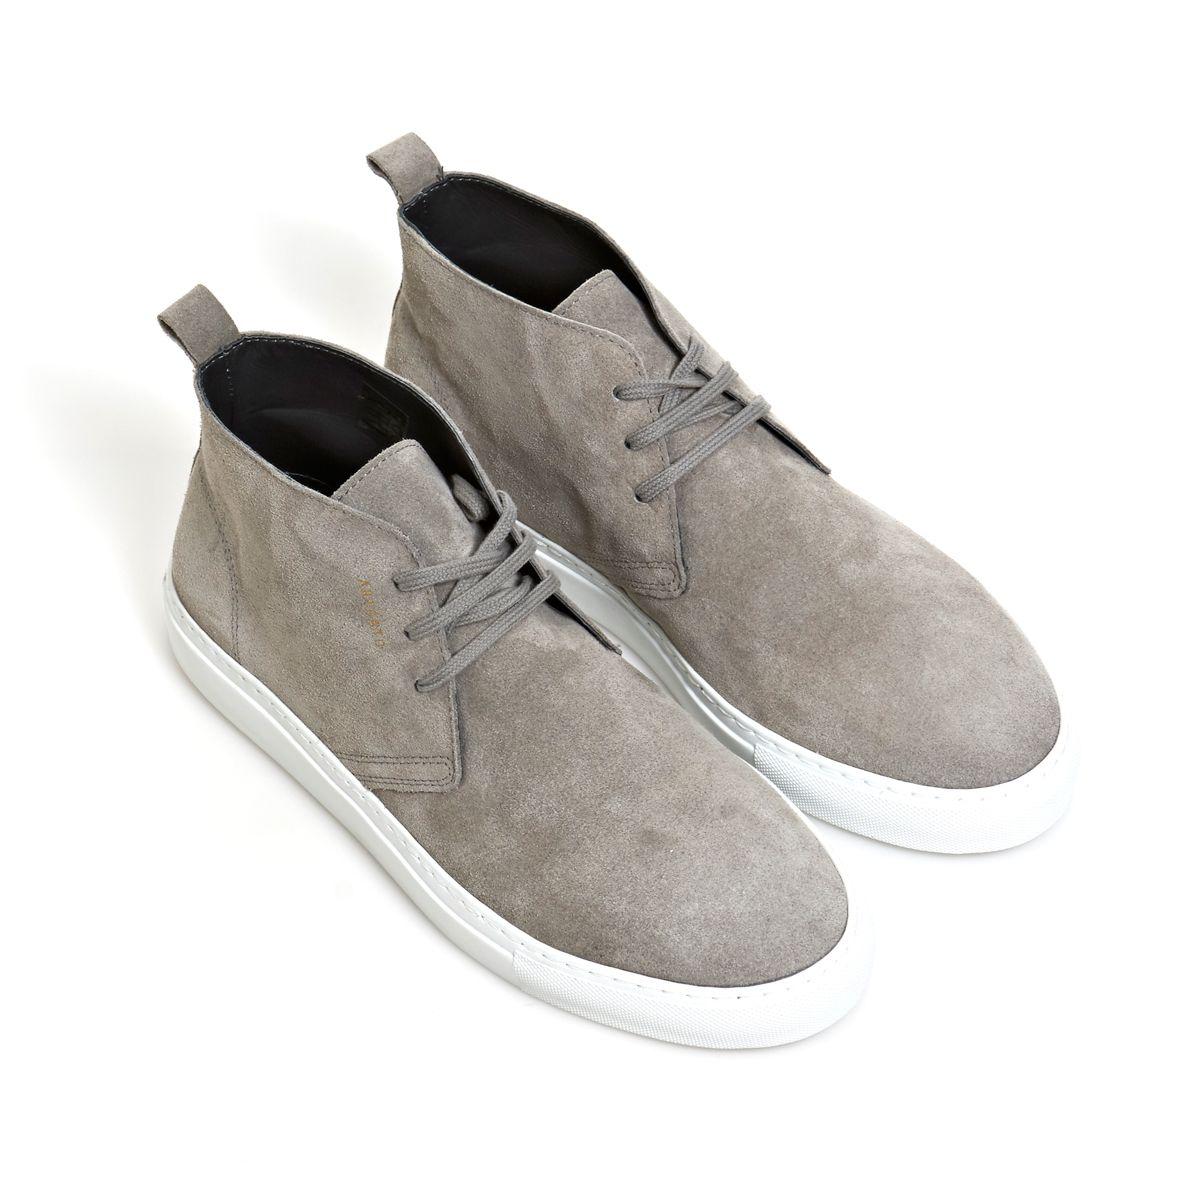 AXEL ARIGATO | Chukka sneakers